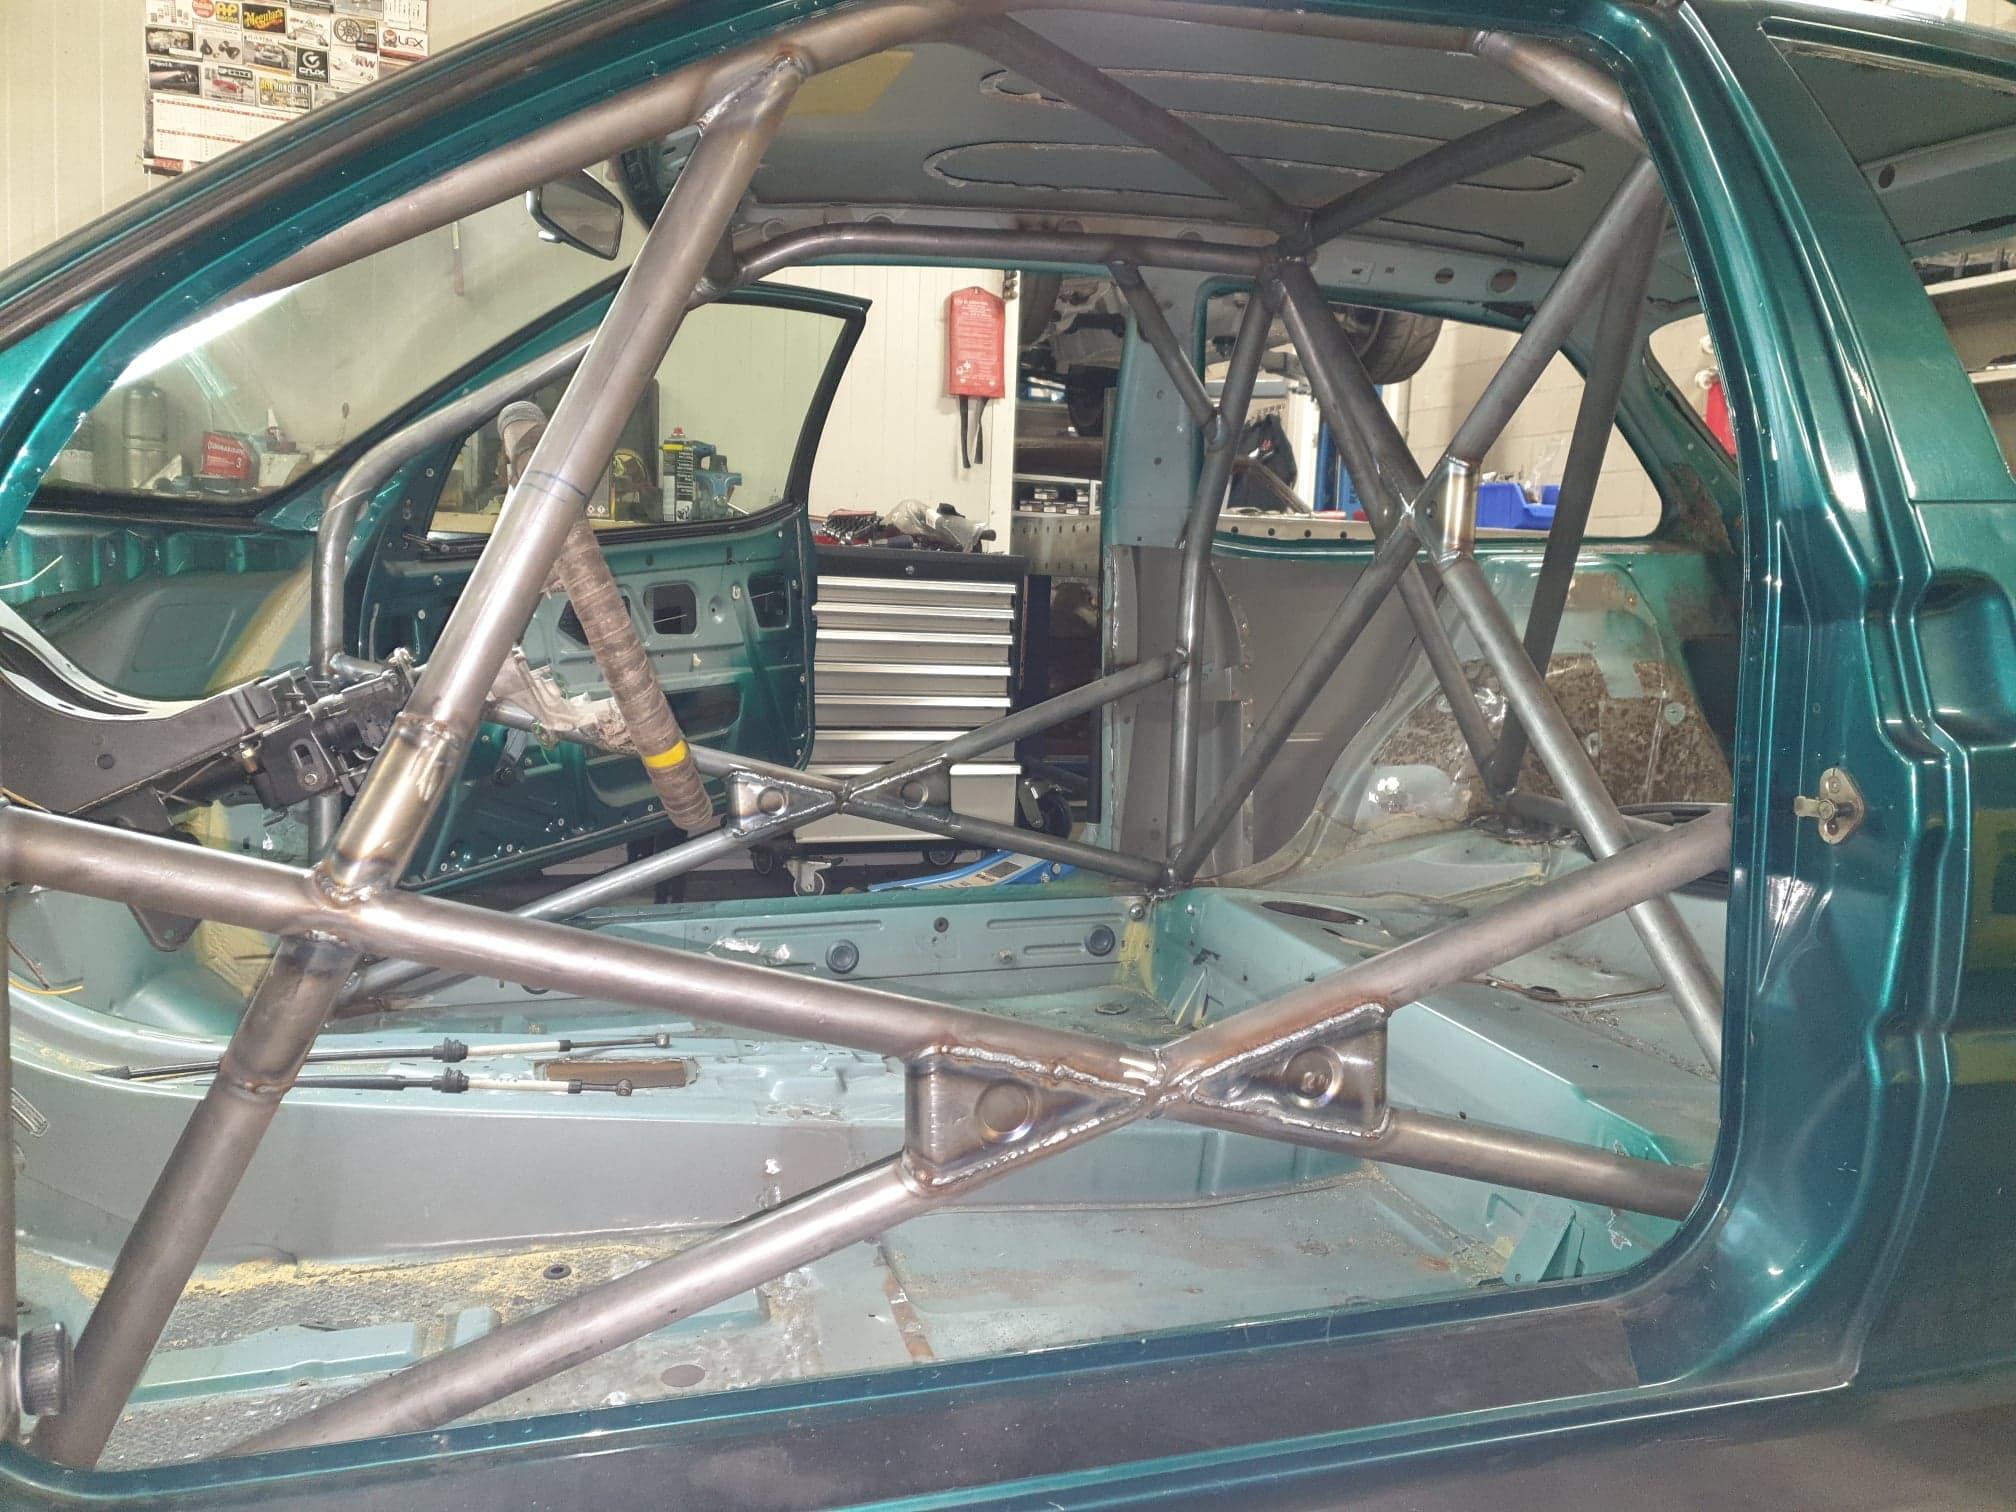 Citroën ZX Rolkooi Ingelast Volgens FIA Annex-J Reglement